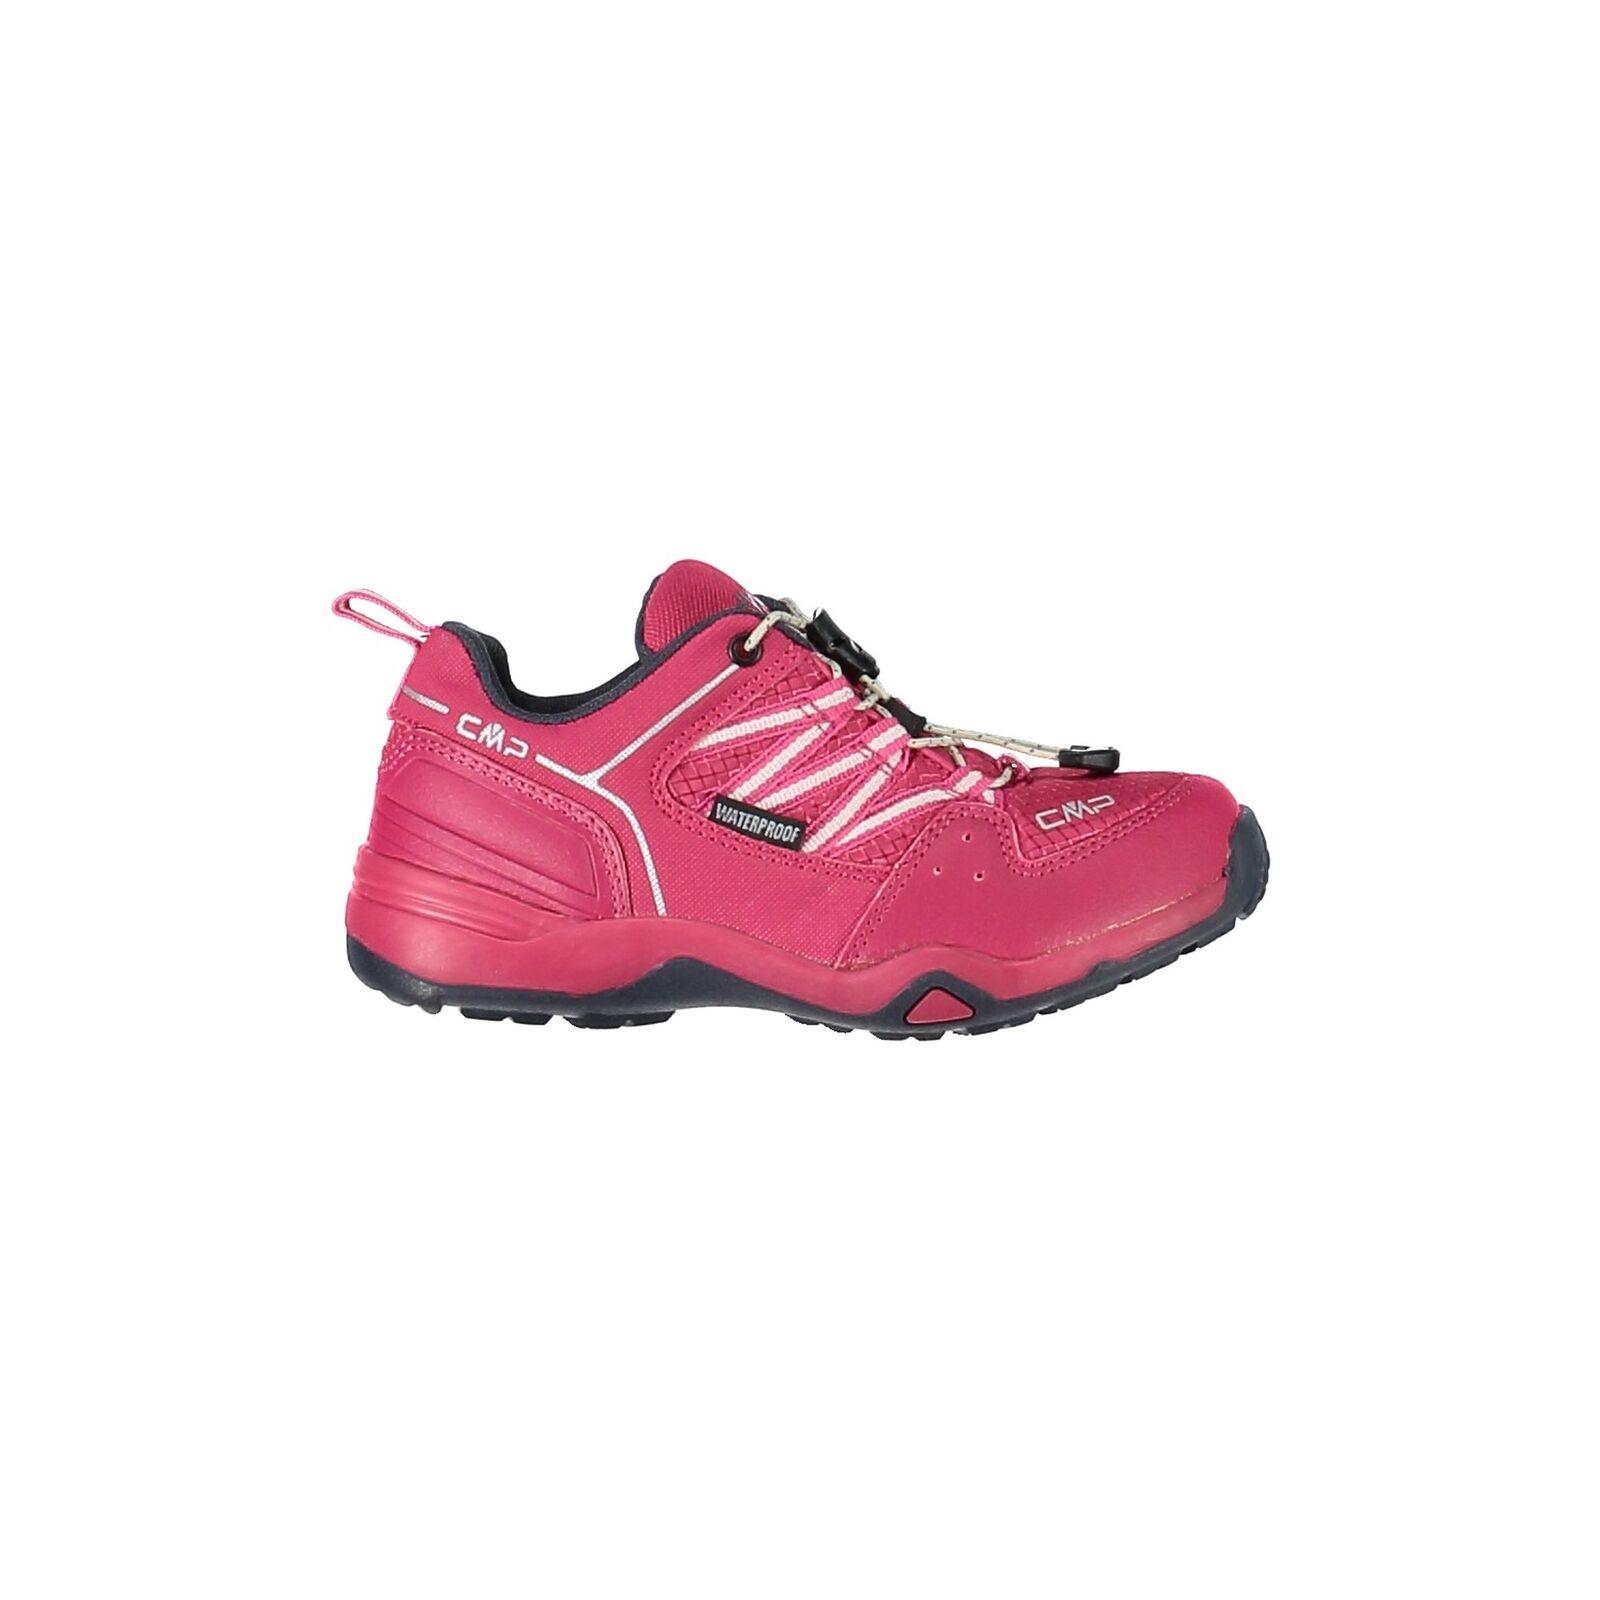 CMP Walking Boots Outdoorschuh Kids Sirius Low Hiking shoes Wp Pink